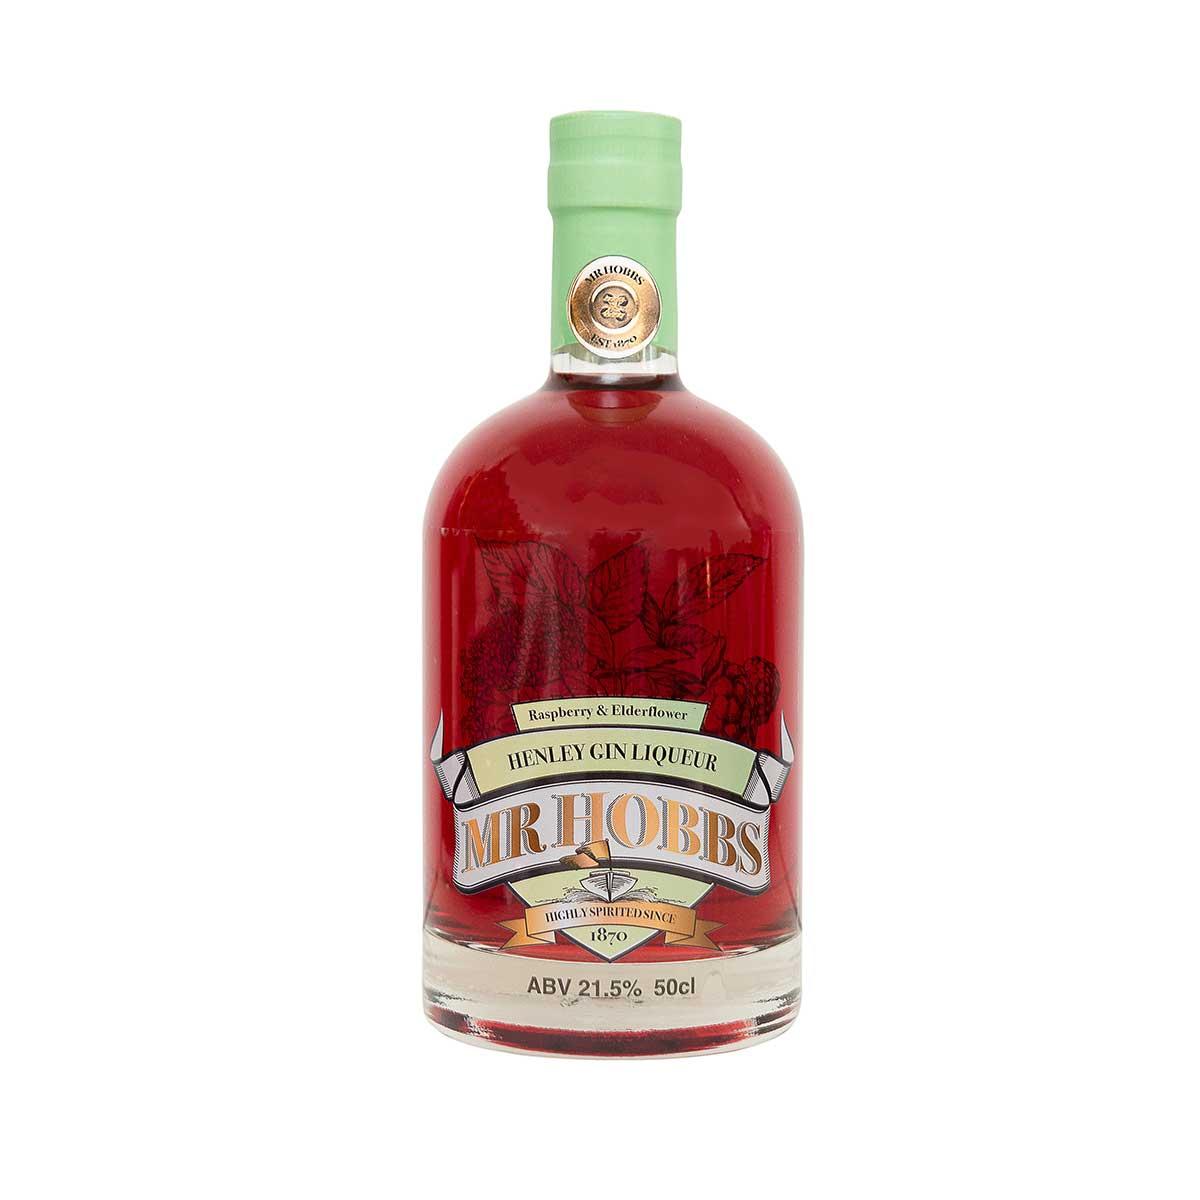 Mr Hobbs Raspberry & Elderflower Gin Liqueur